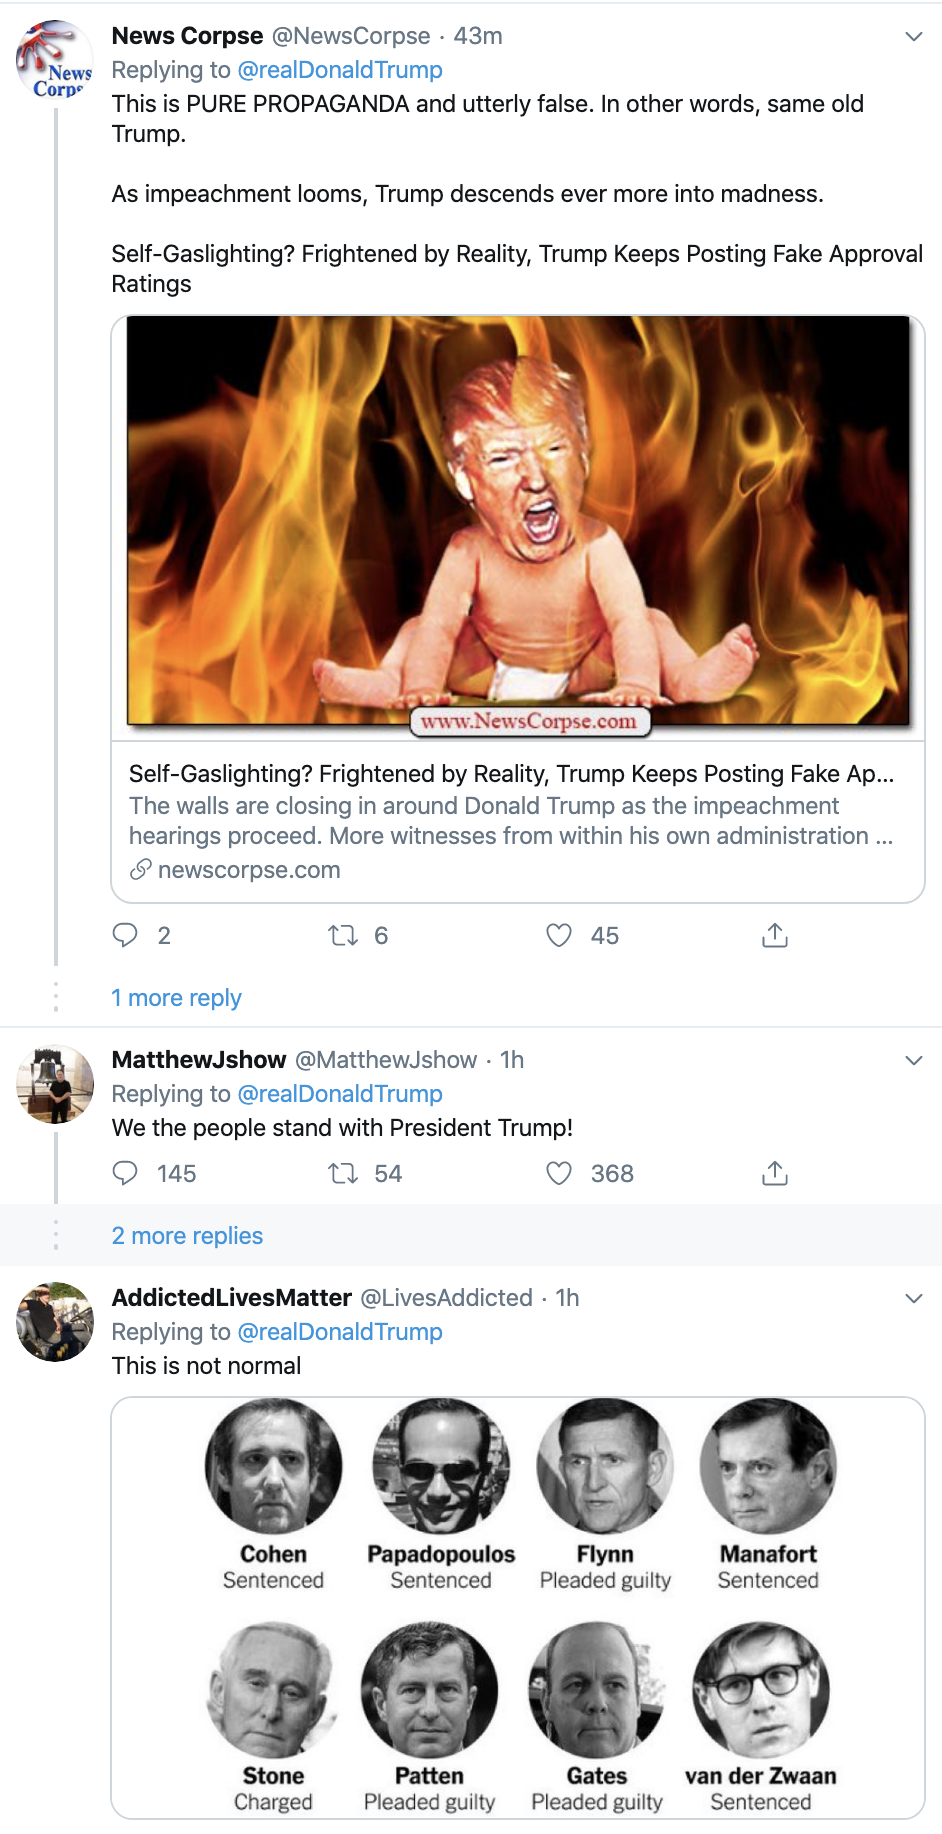 Screen-Shot-2019-11-19-at-11.57.45-AM Trump Tweets Ominous Video During Impeachment Proceedings Corruption Impeachment Investigation Politics Top Stories